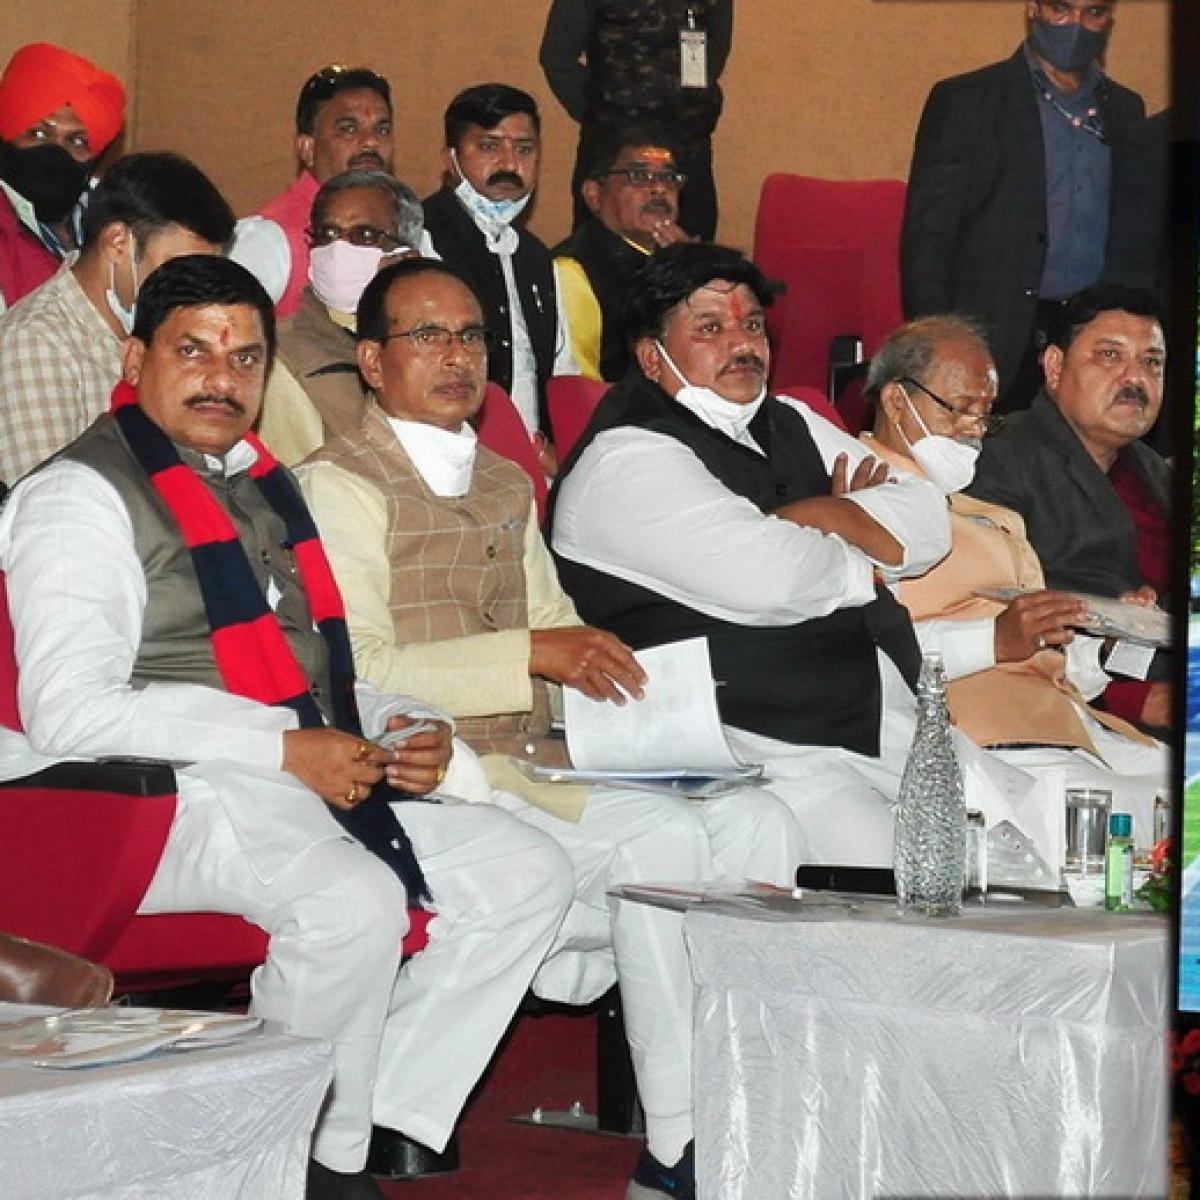 Ujjain: Kamal Nath did not sanction Rs 300 crore, rather we sanctioned Rs 500 crore, says Shivraj on Mahakal Project